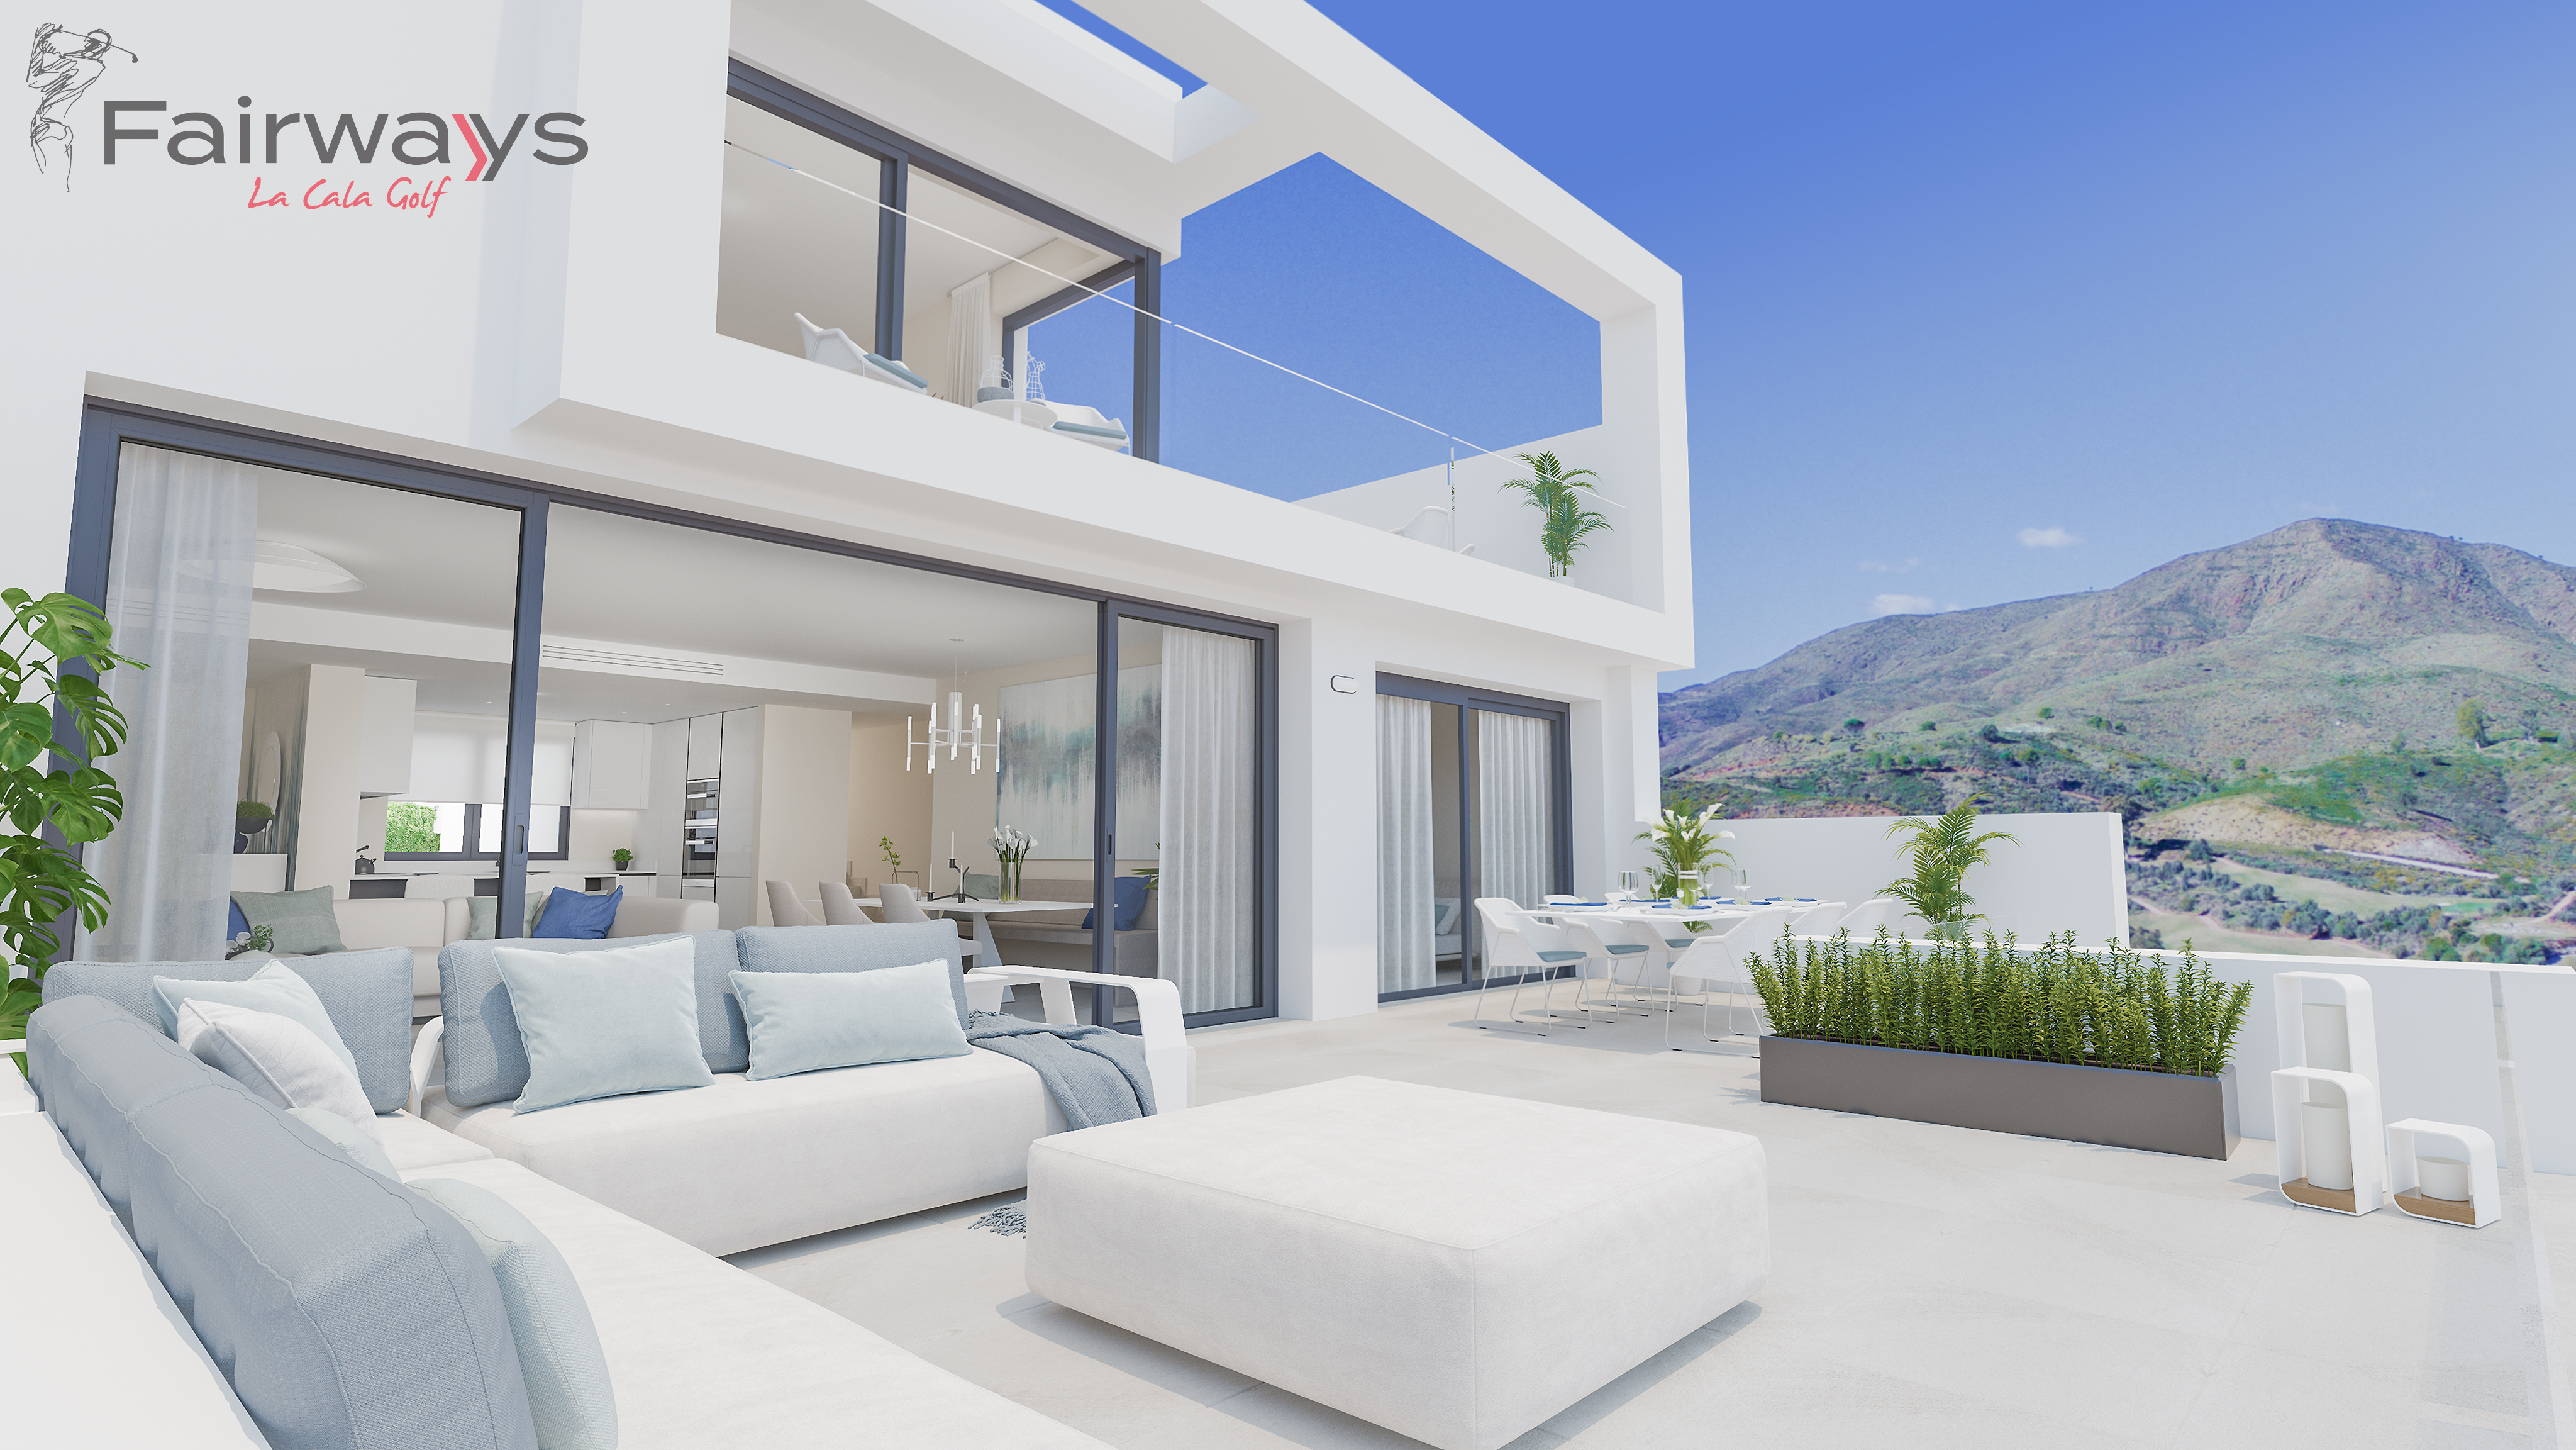 Fairways La Cala Golf New Apartment Development